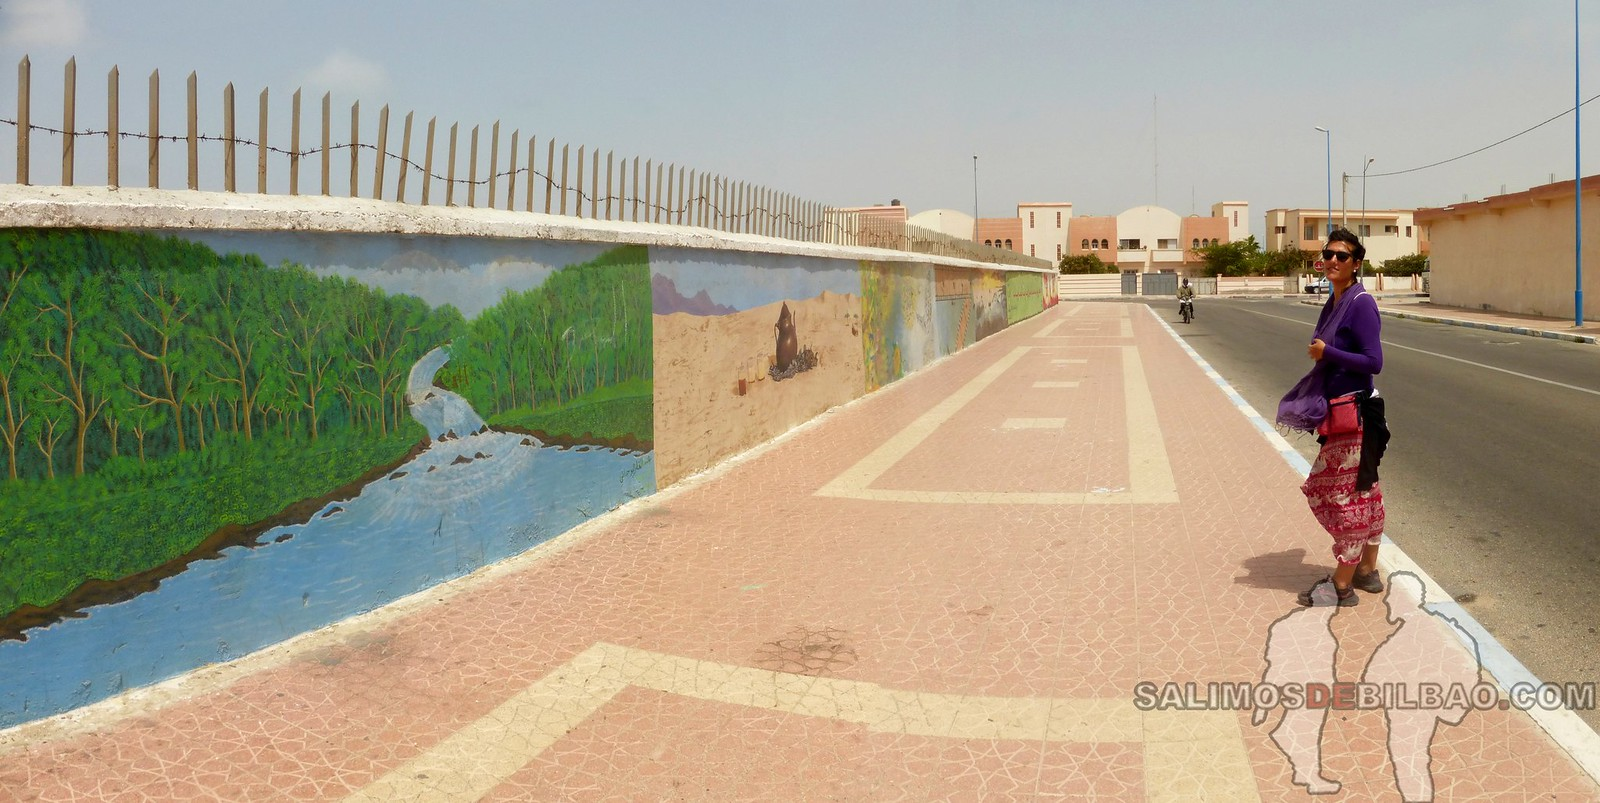 180. Saioa, Pano, Grafitis, Paseo del al centro, Dakhla